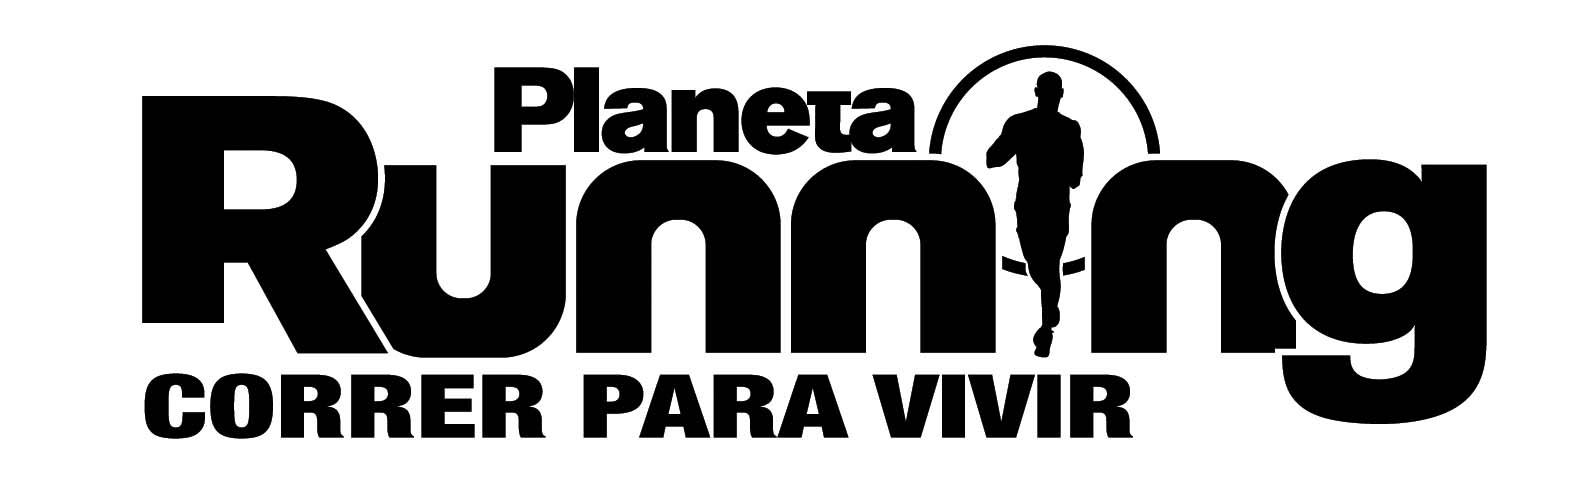 www.planetarunning.com